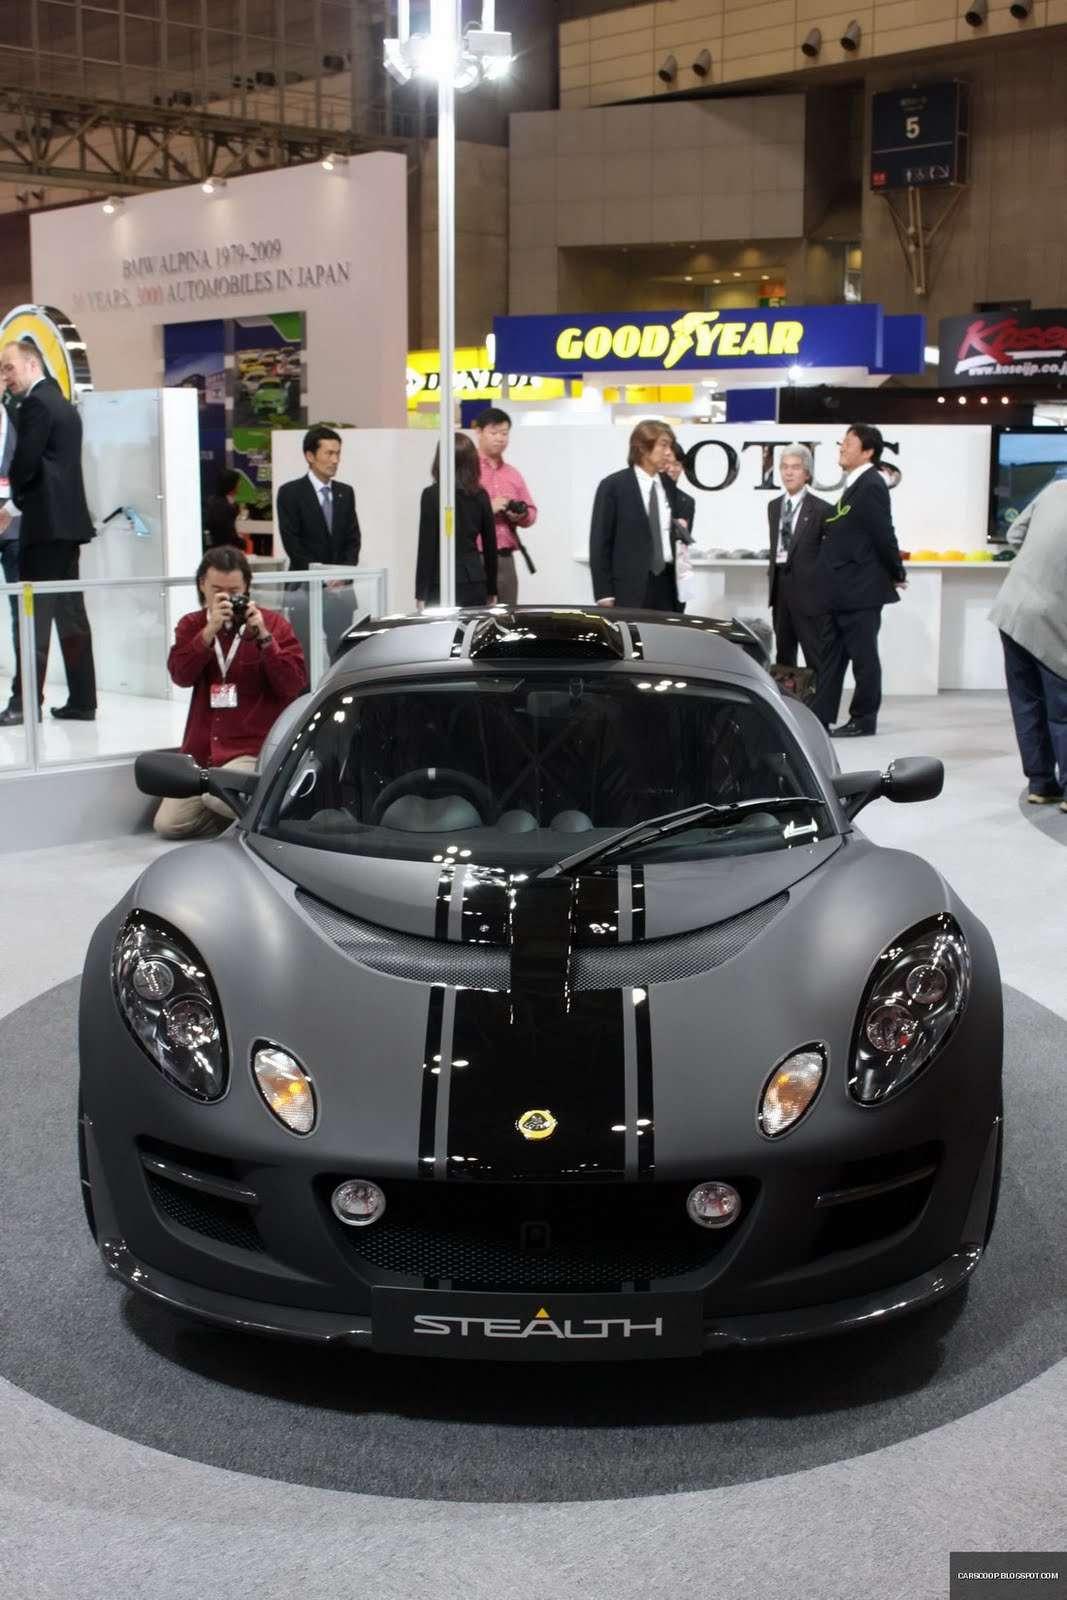 Tokio 2009: Lotus Exige Scura Stealth